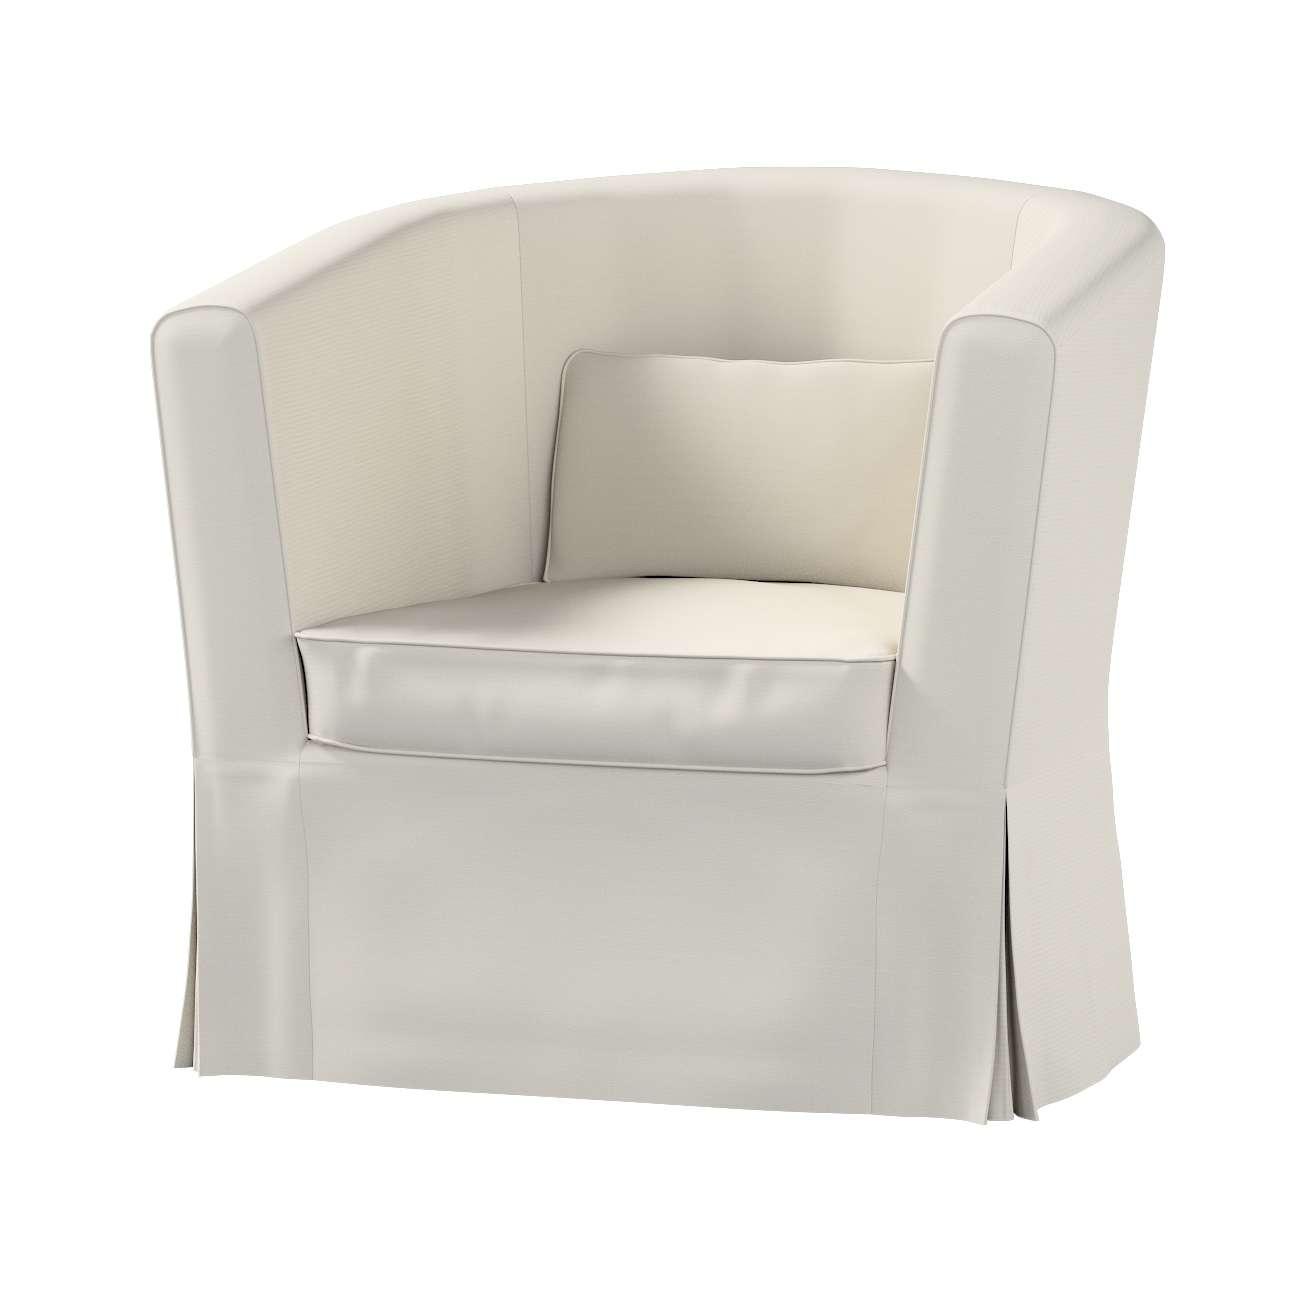 Ektorp Tullsta Sesselbezug von der Kollektion Cotton Panama, Stoff: 702-31